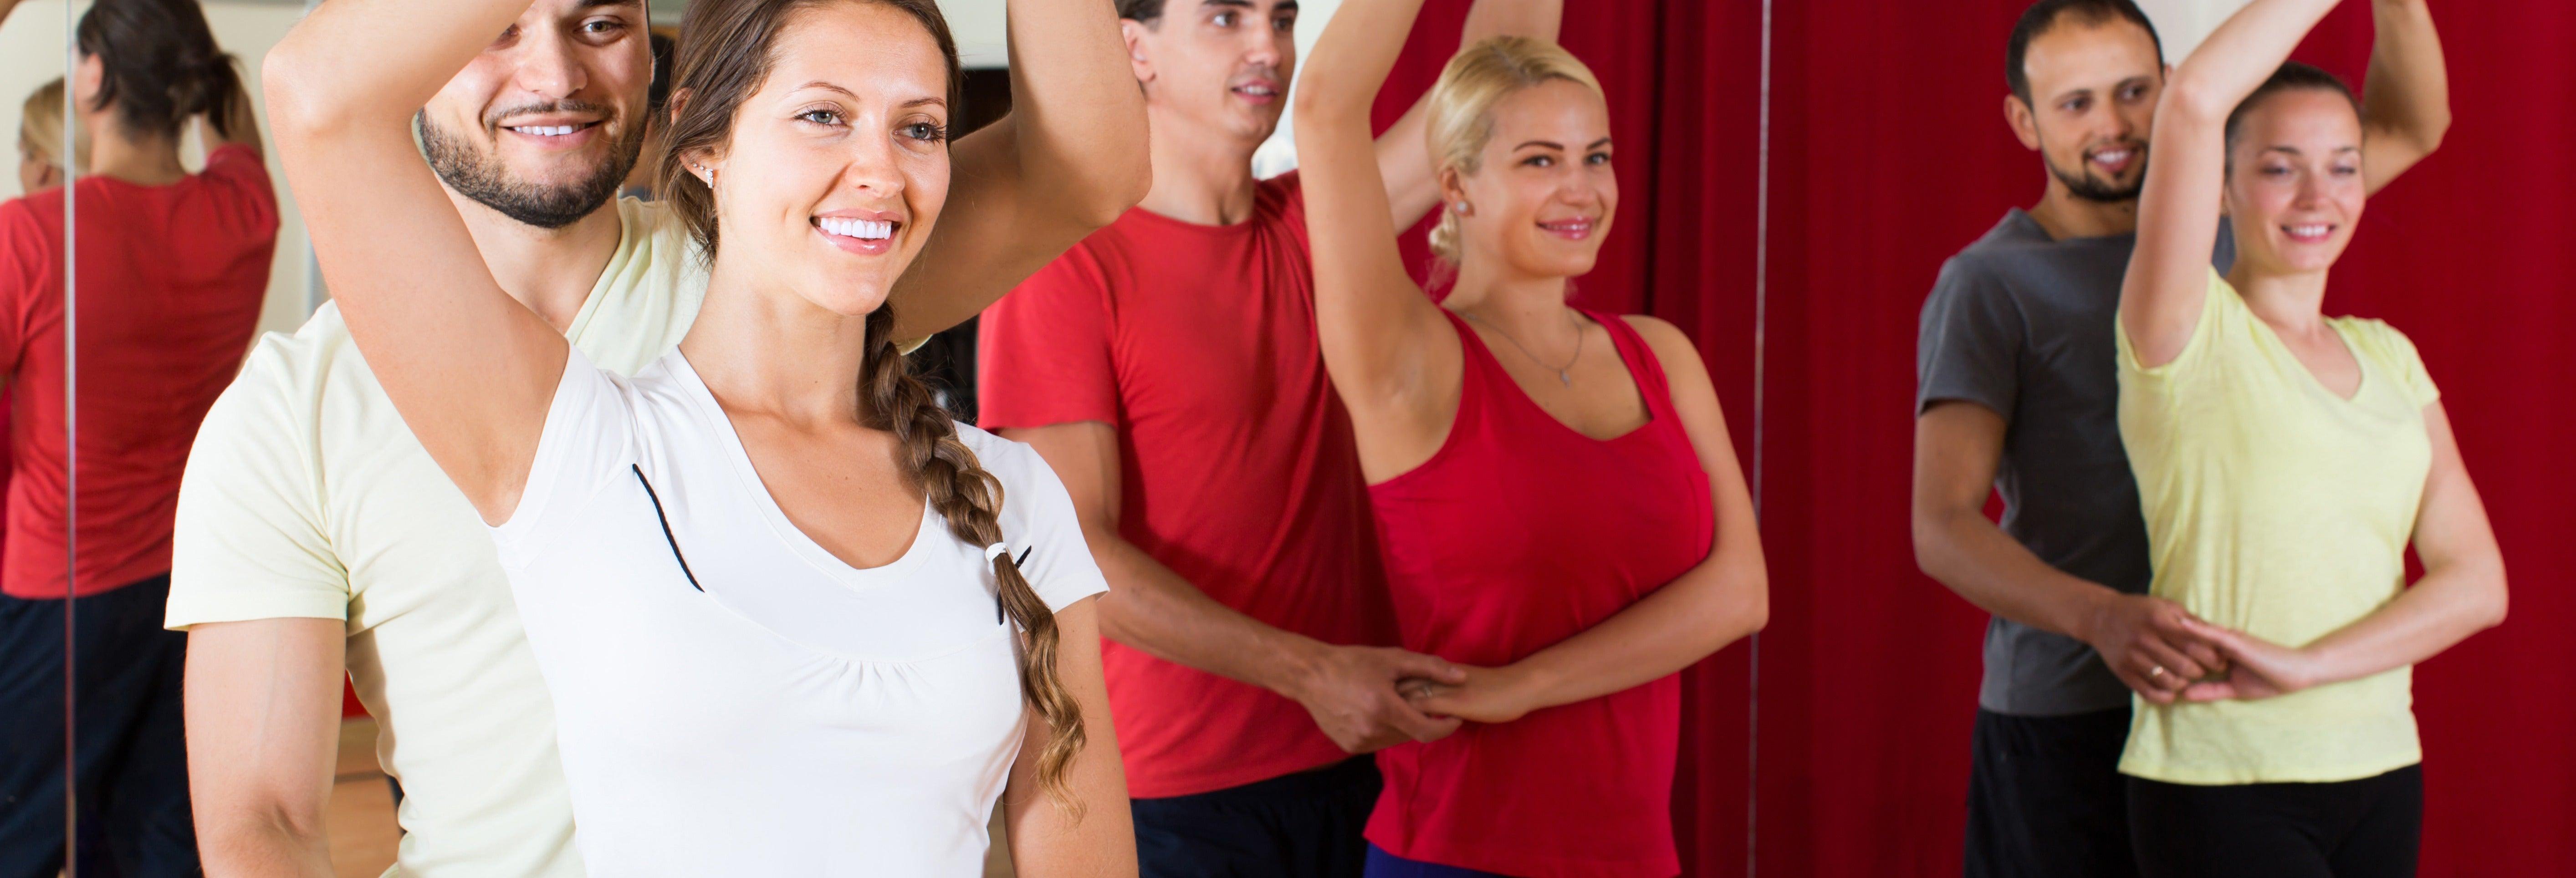 Clase de baile en La Habana